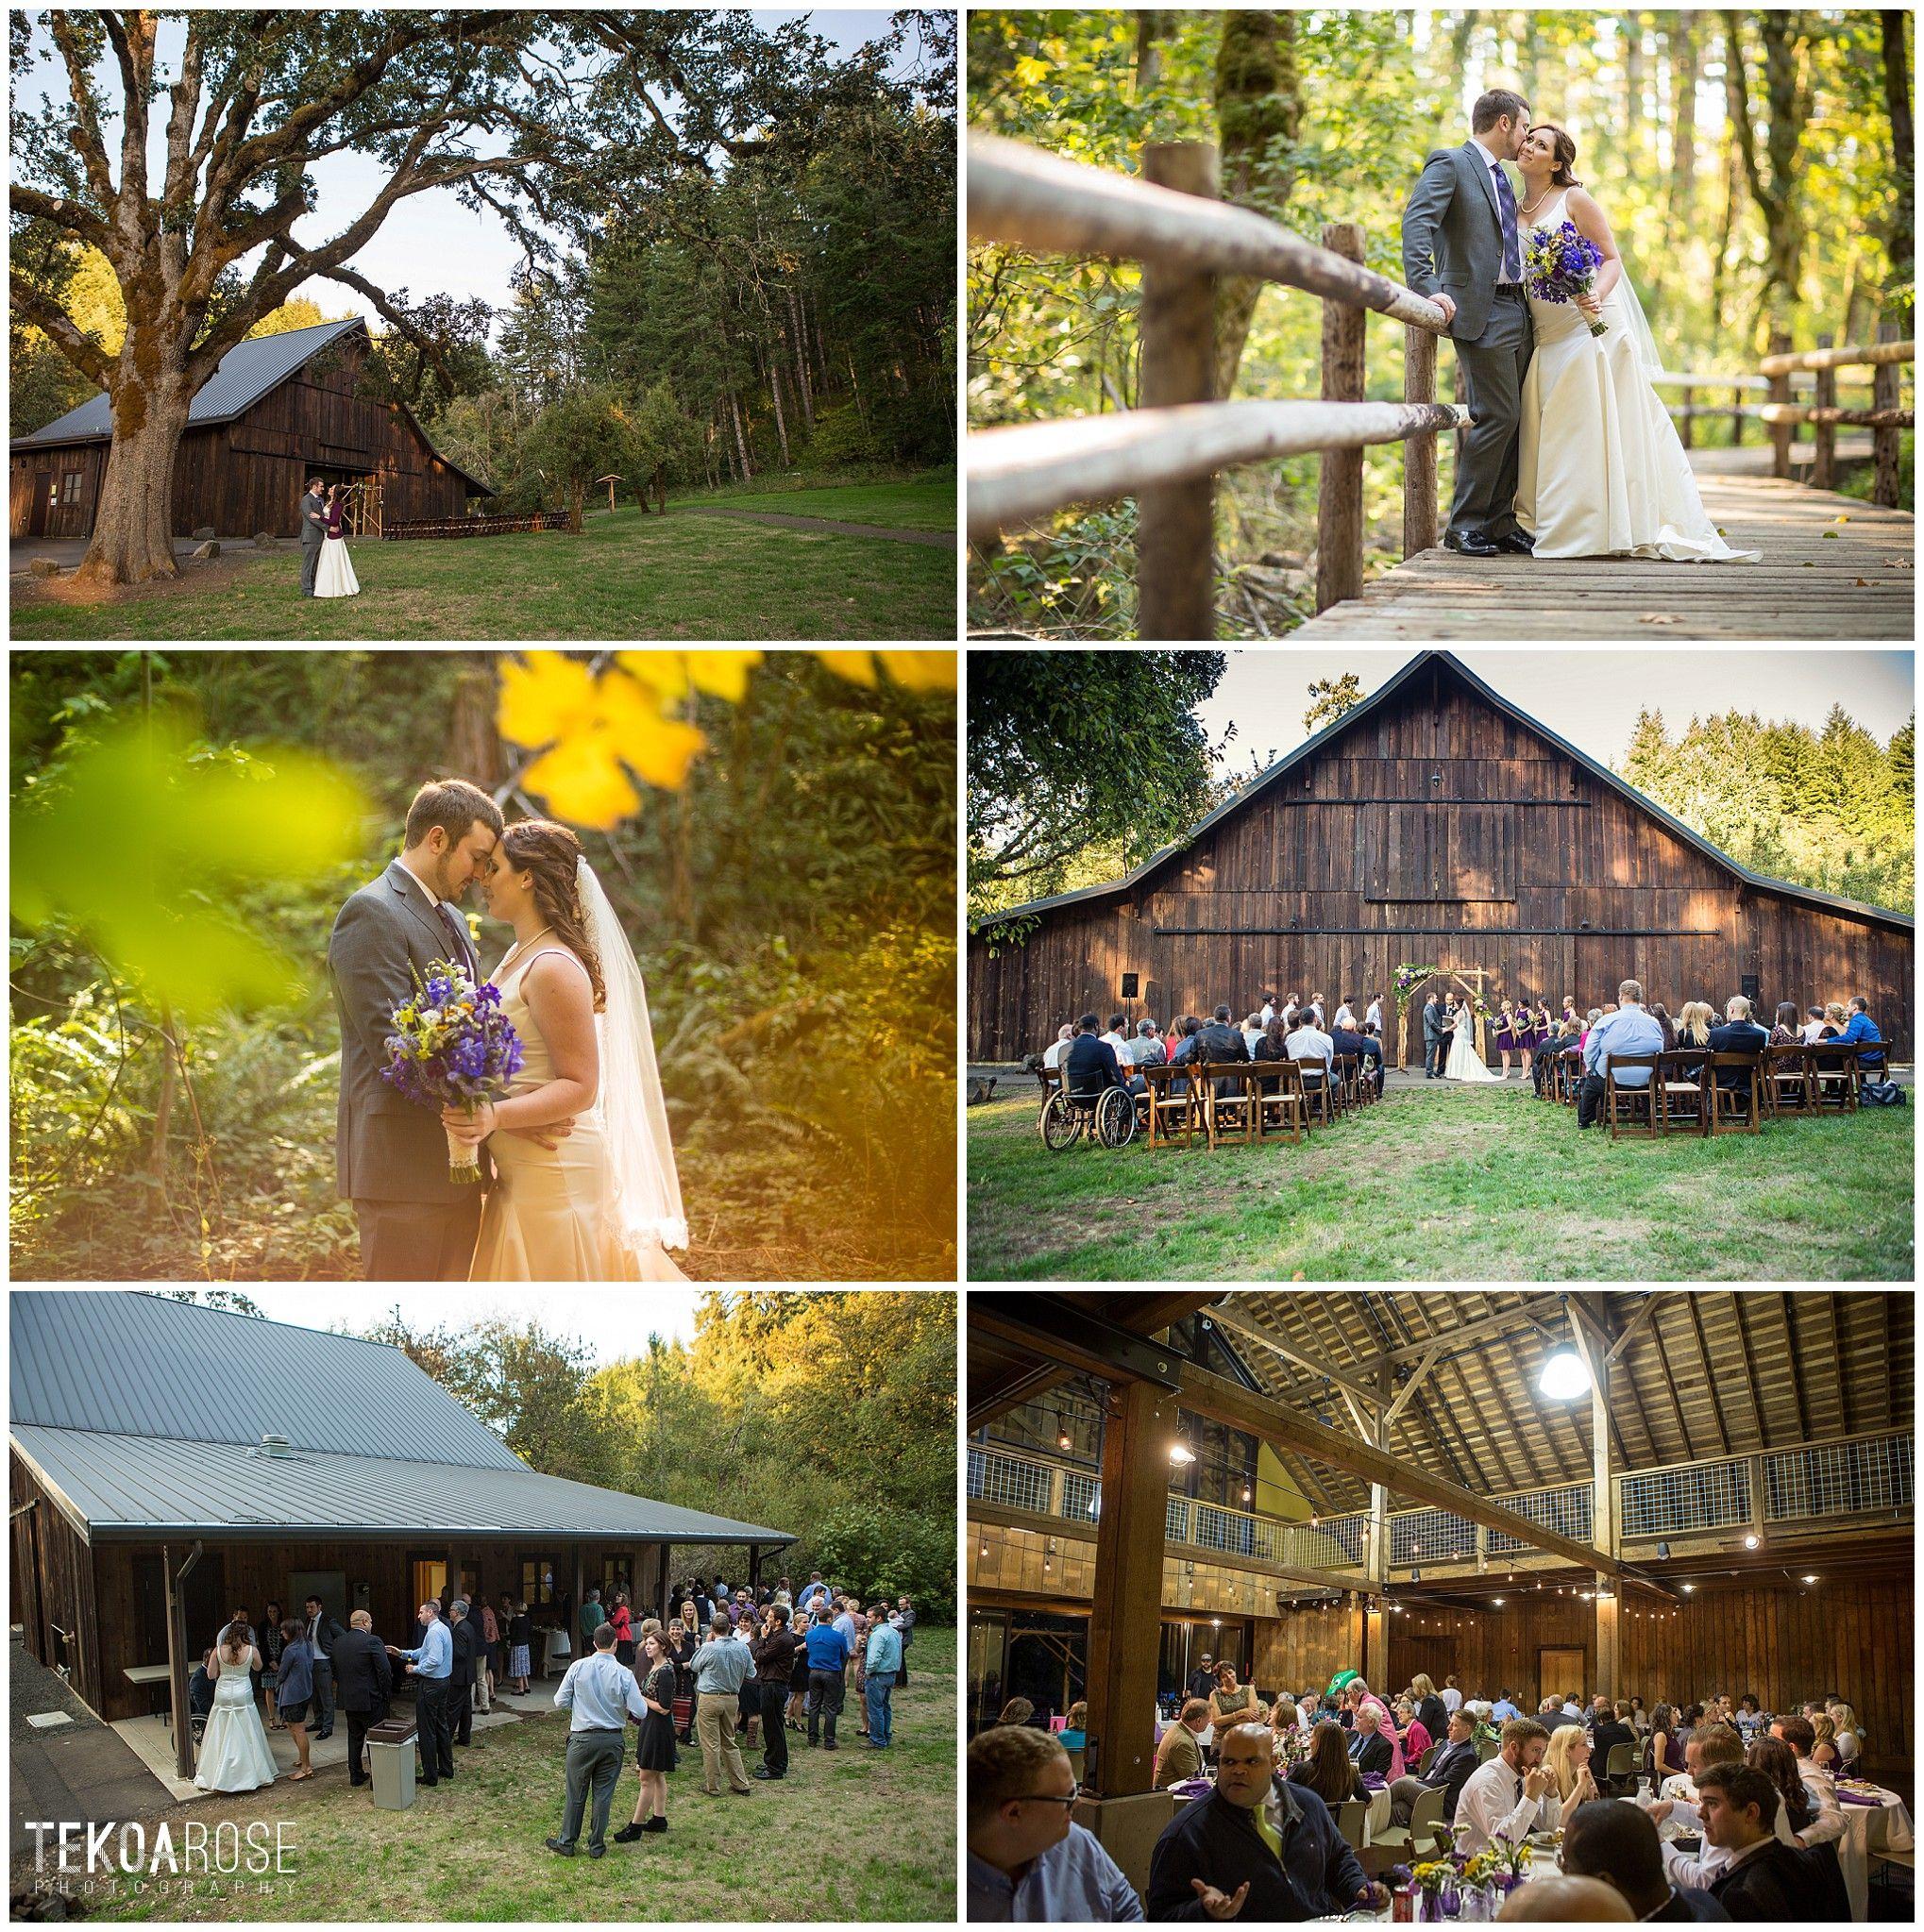 Dan and Liz's Wedding Farm wedding venue, Rustic barn